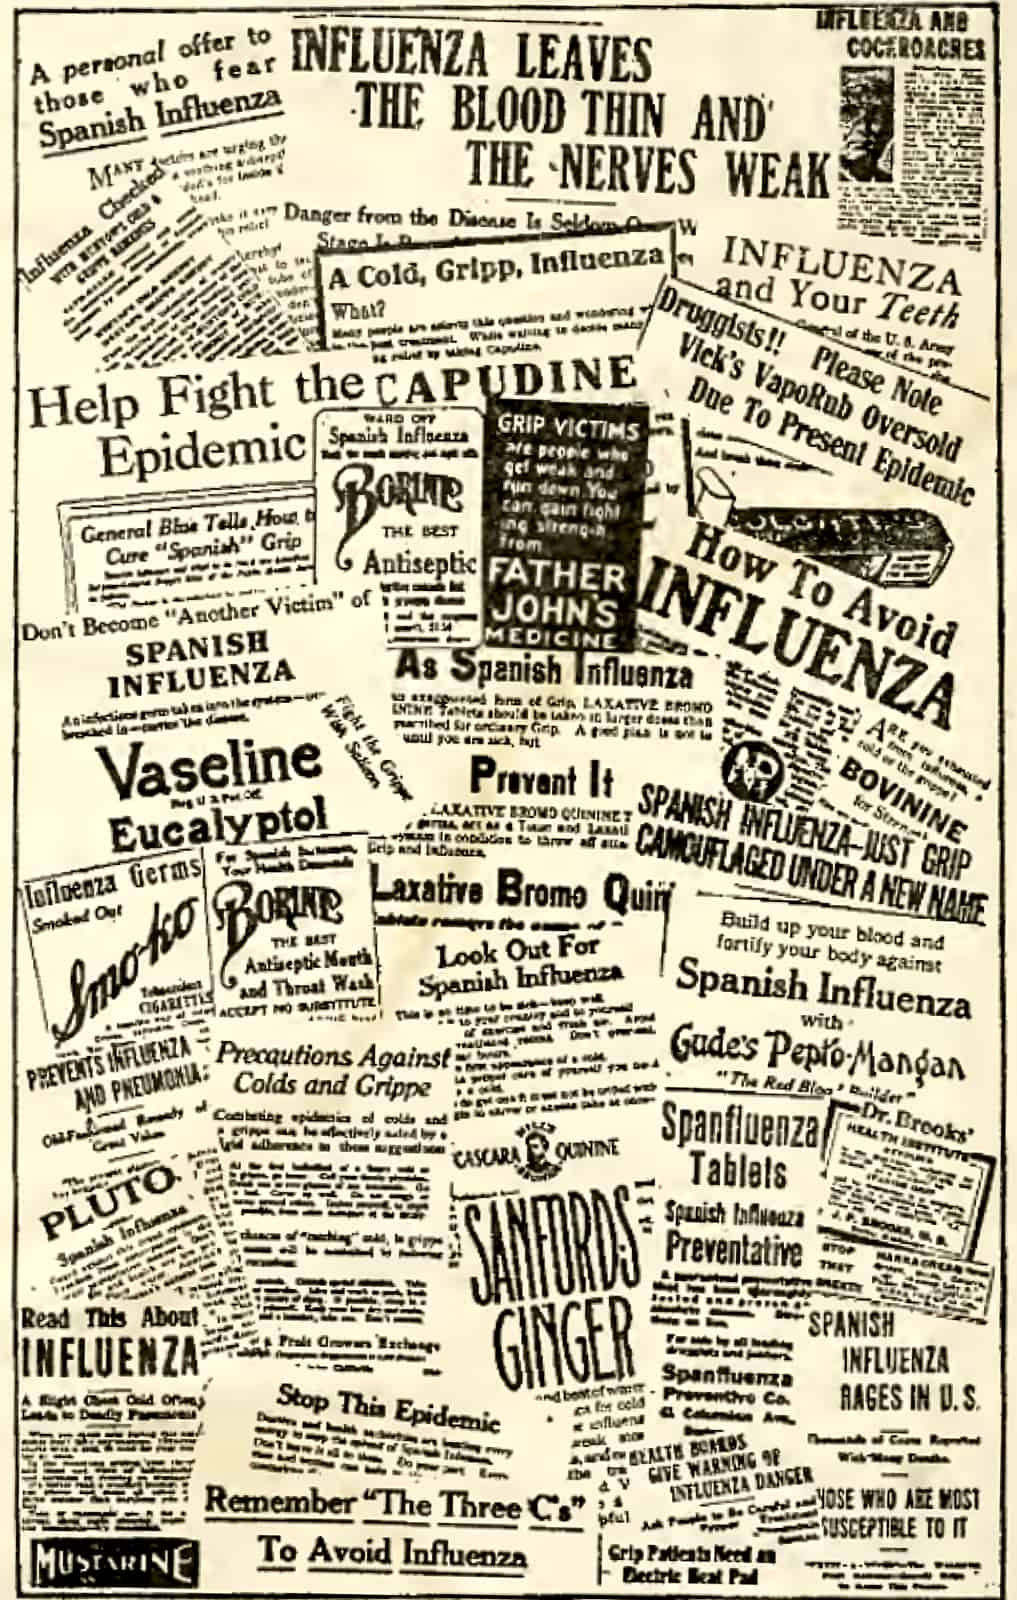 shows newspaper headlines that talk about influenza